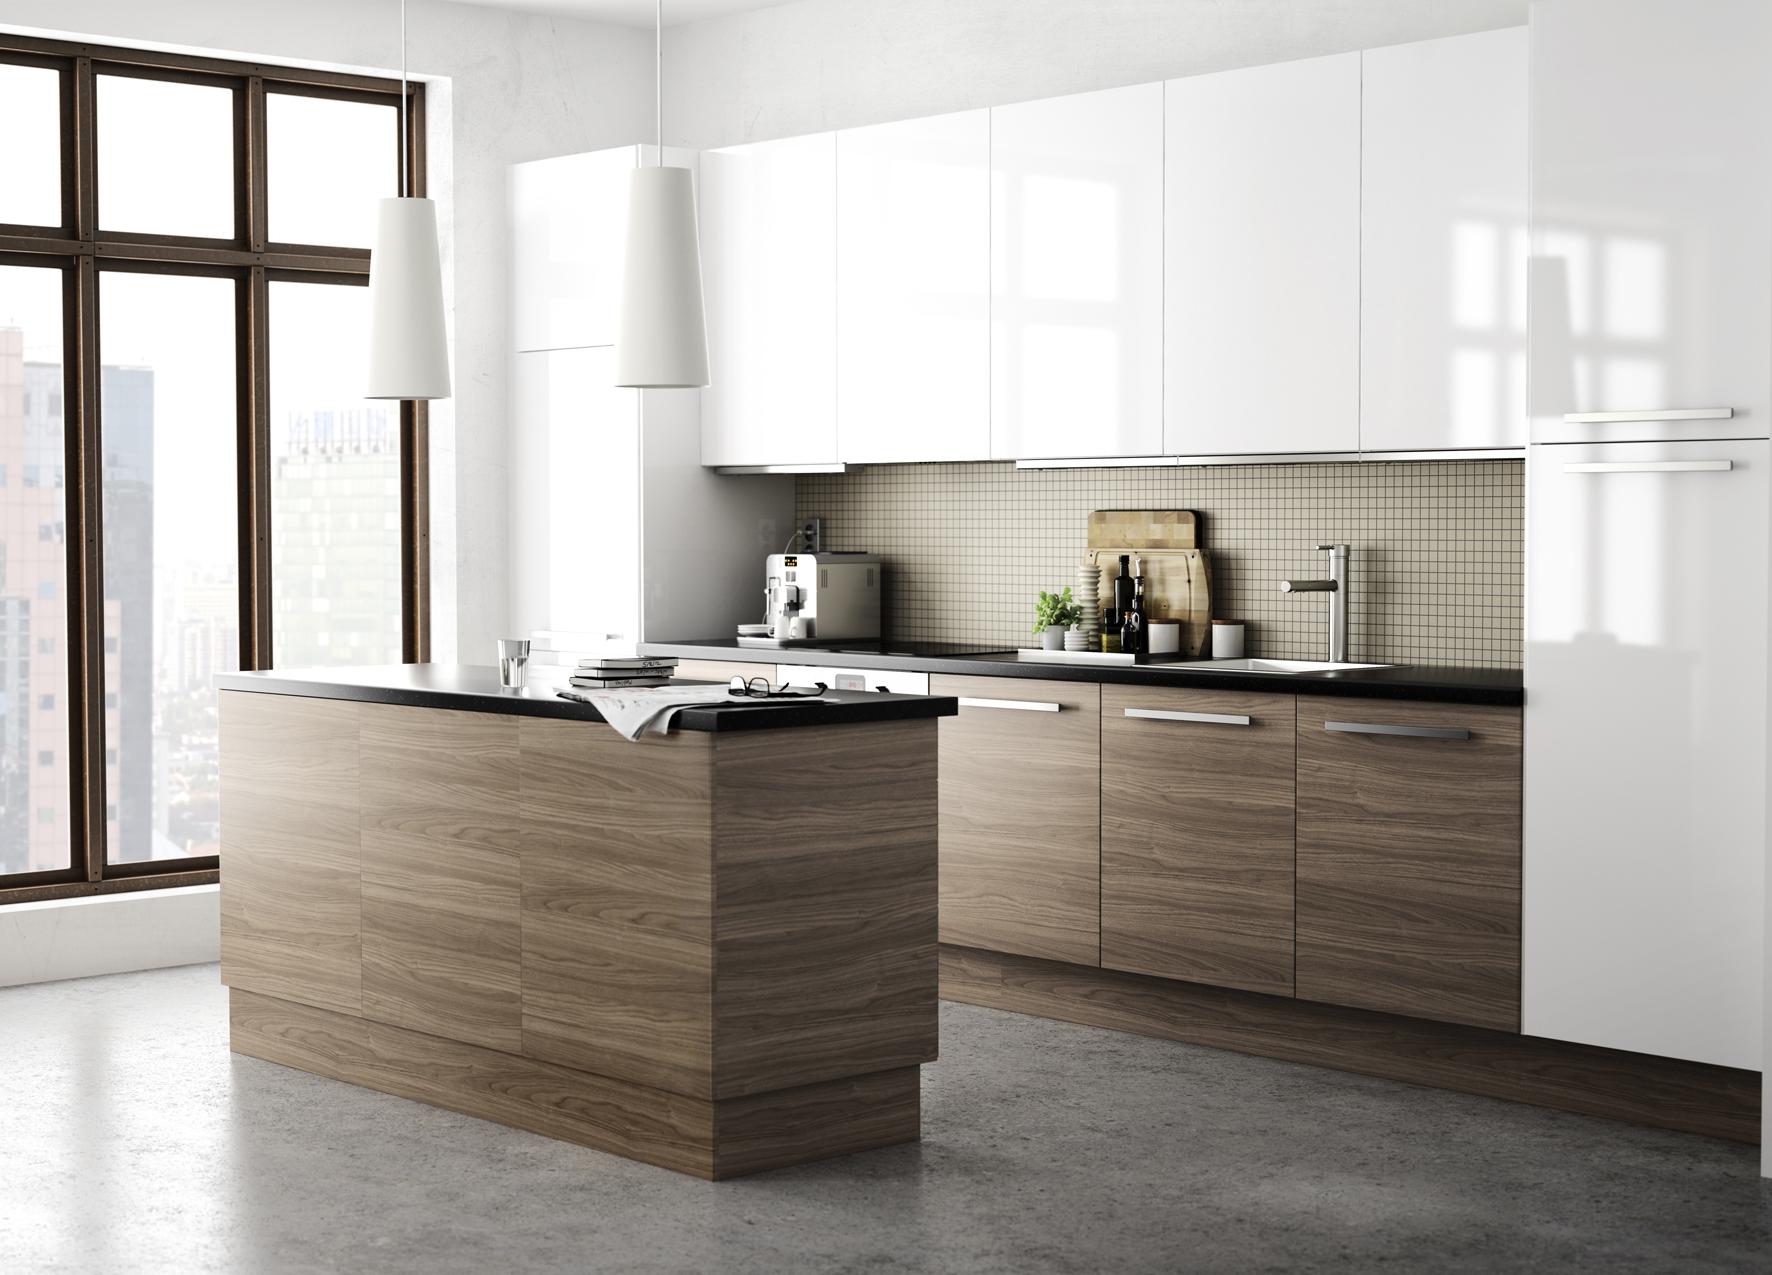 mooie korting op ikea keukens faktum nieuws startpagina. Black Bedroom Furniture Sets. Home Design Ideas